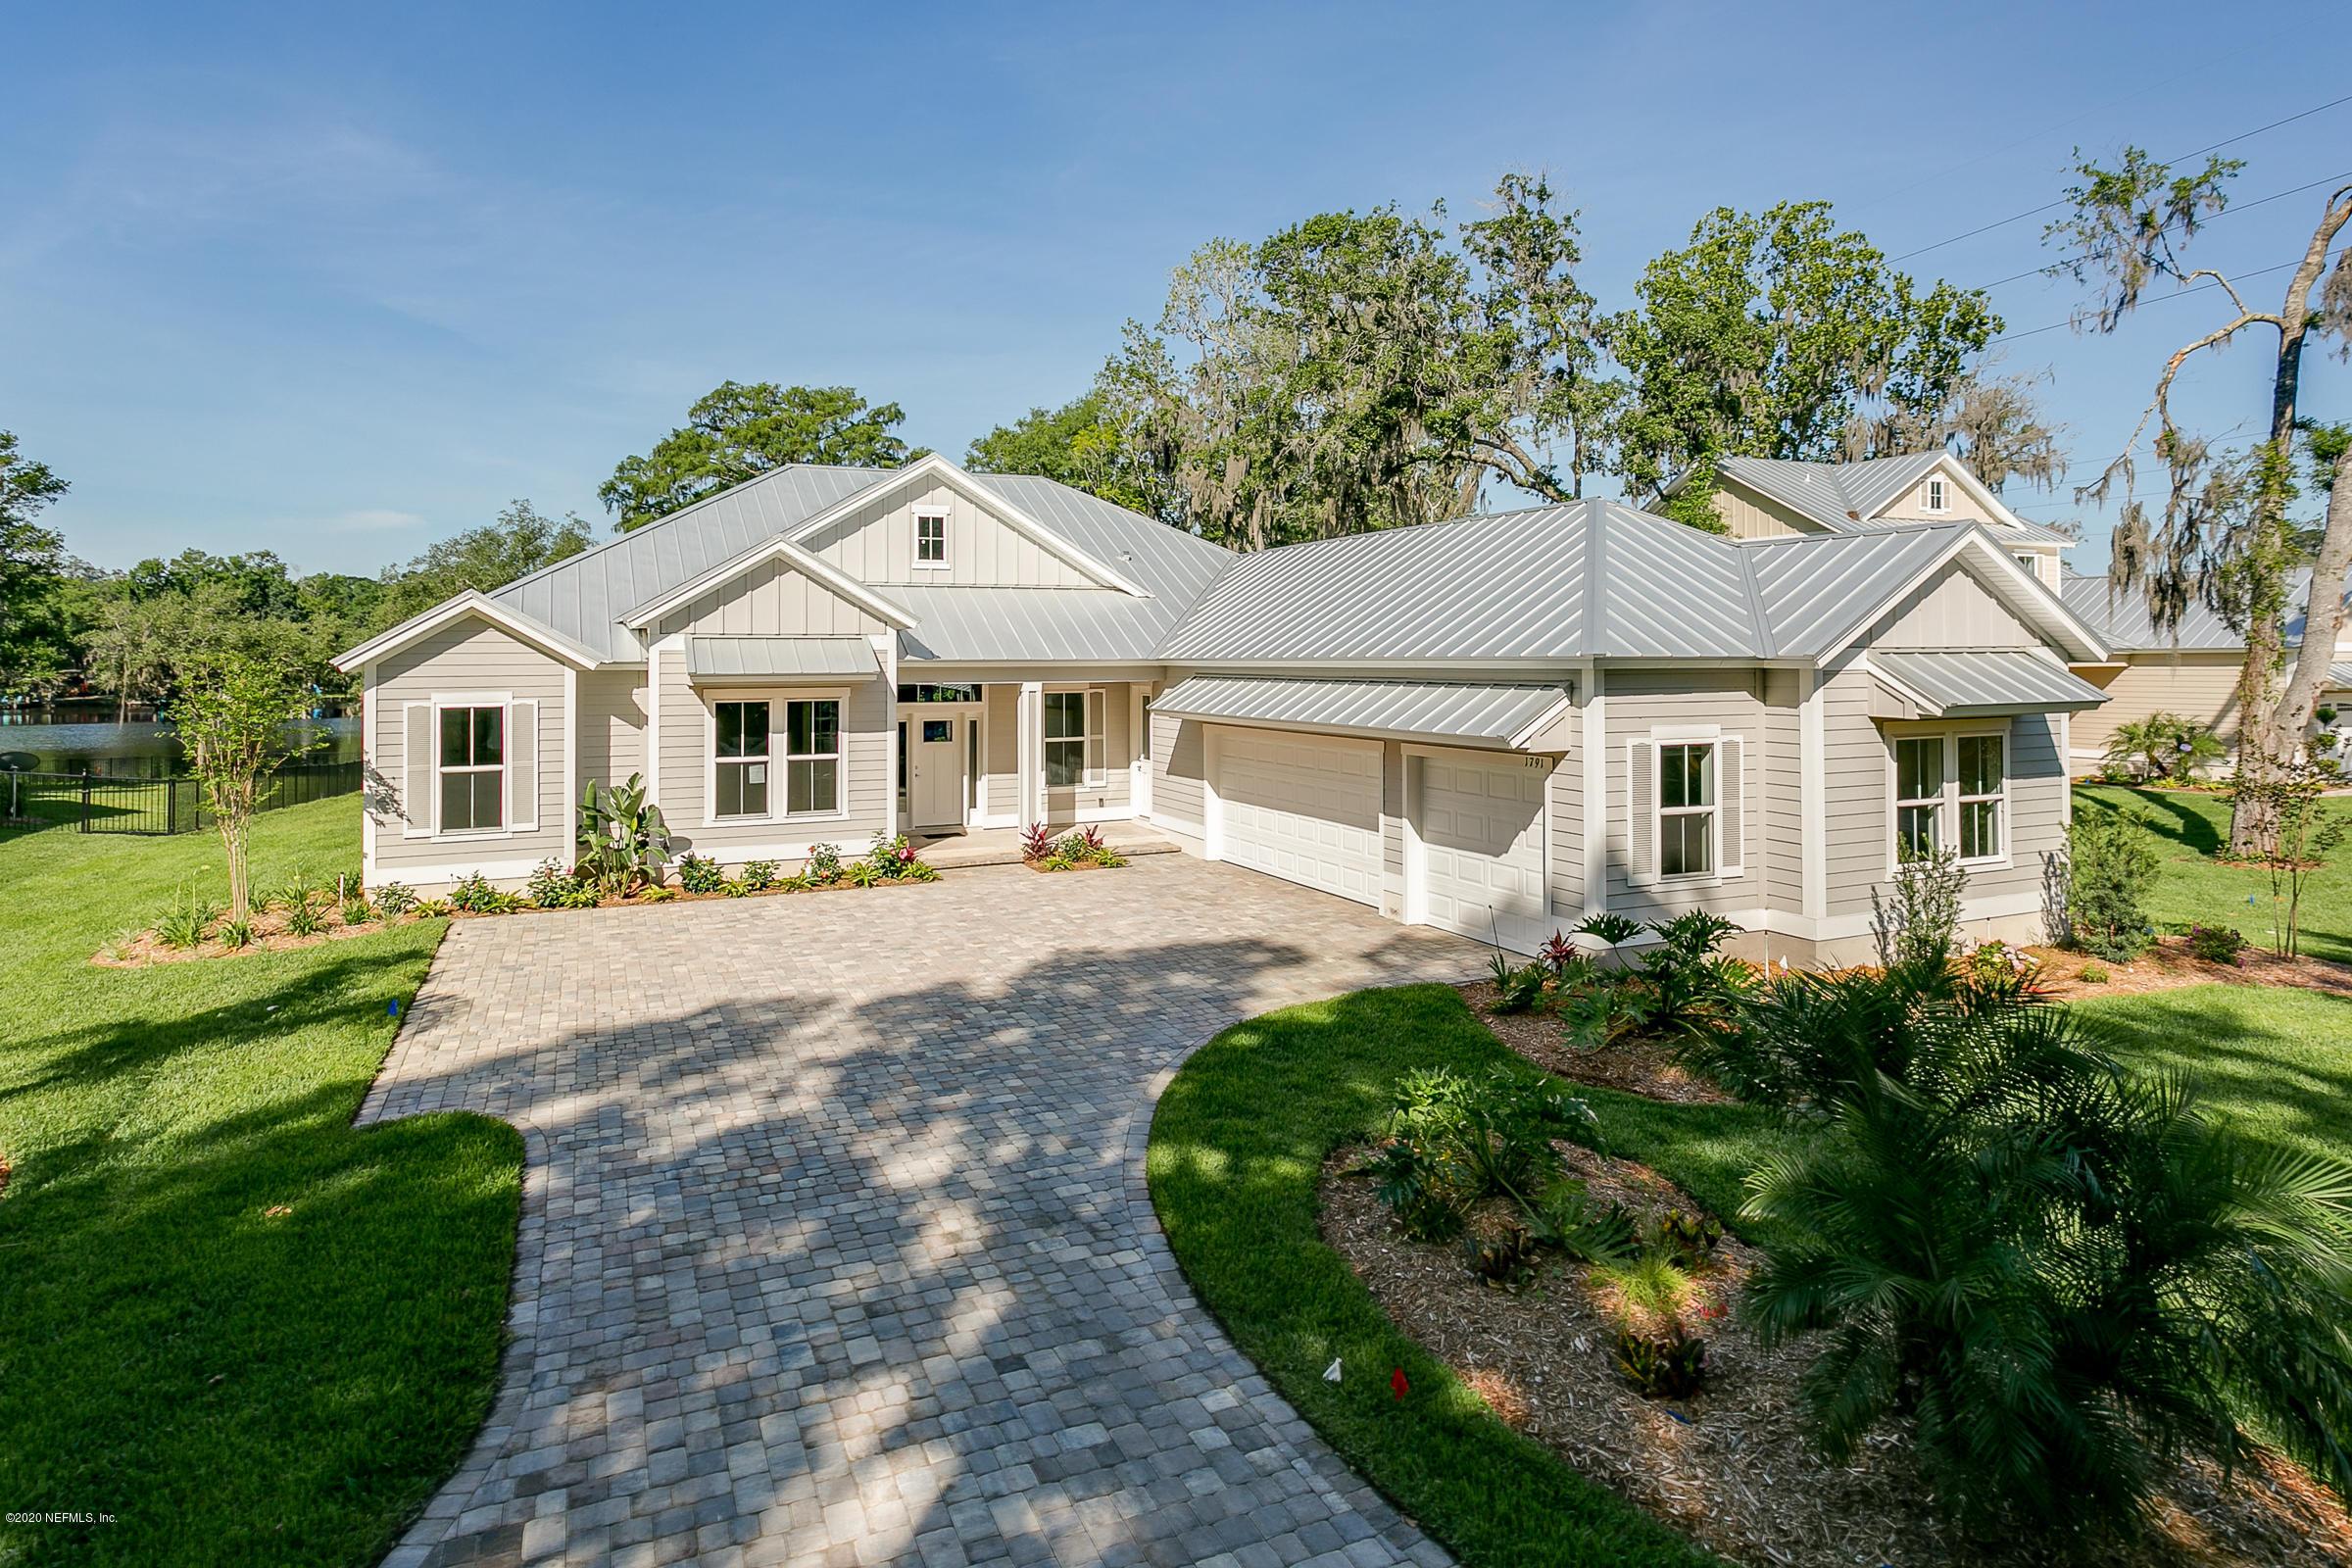 LOT 2 OSPREY LANDING, FLEMING ISLAND, FLORIDA 32003, 4 Bedrooms Bedrooms, ,3 BathroomsBathrooms,Residential,For sale,OSPREY LANDING,1071035